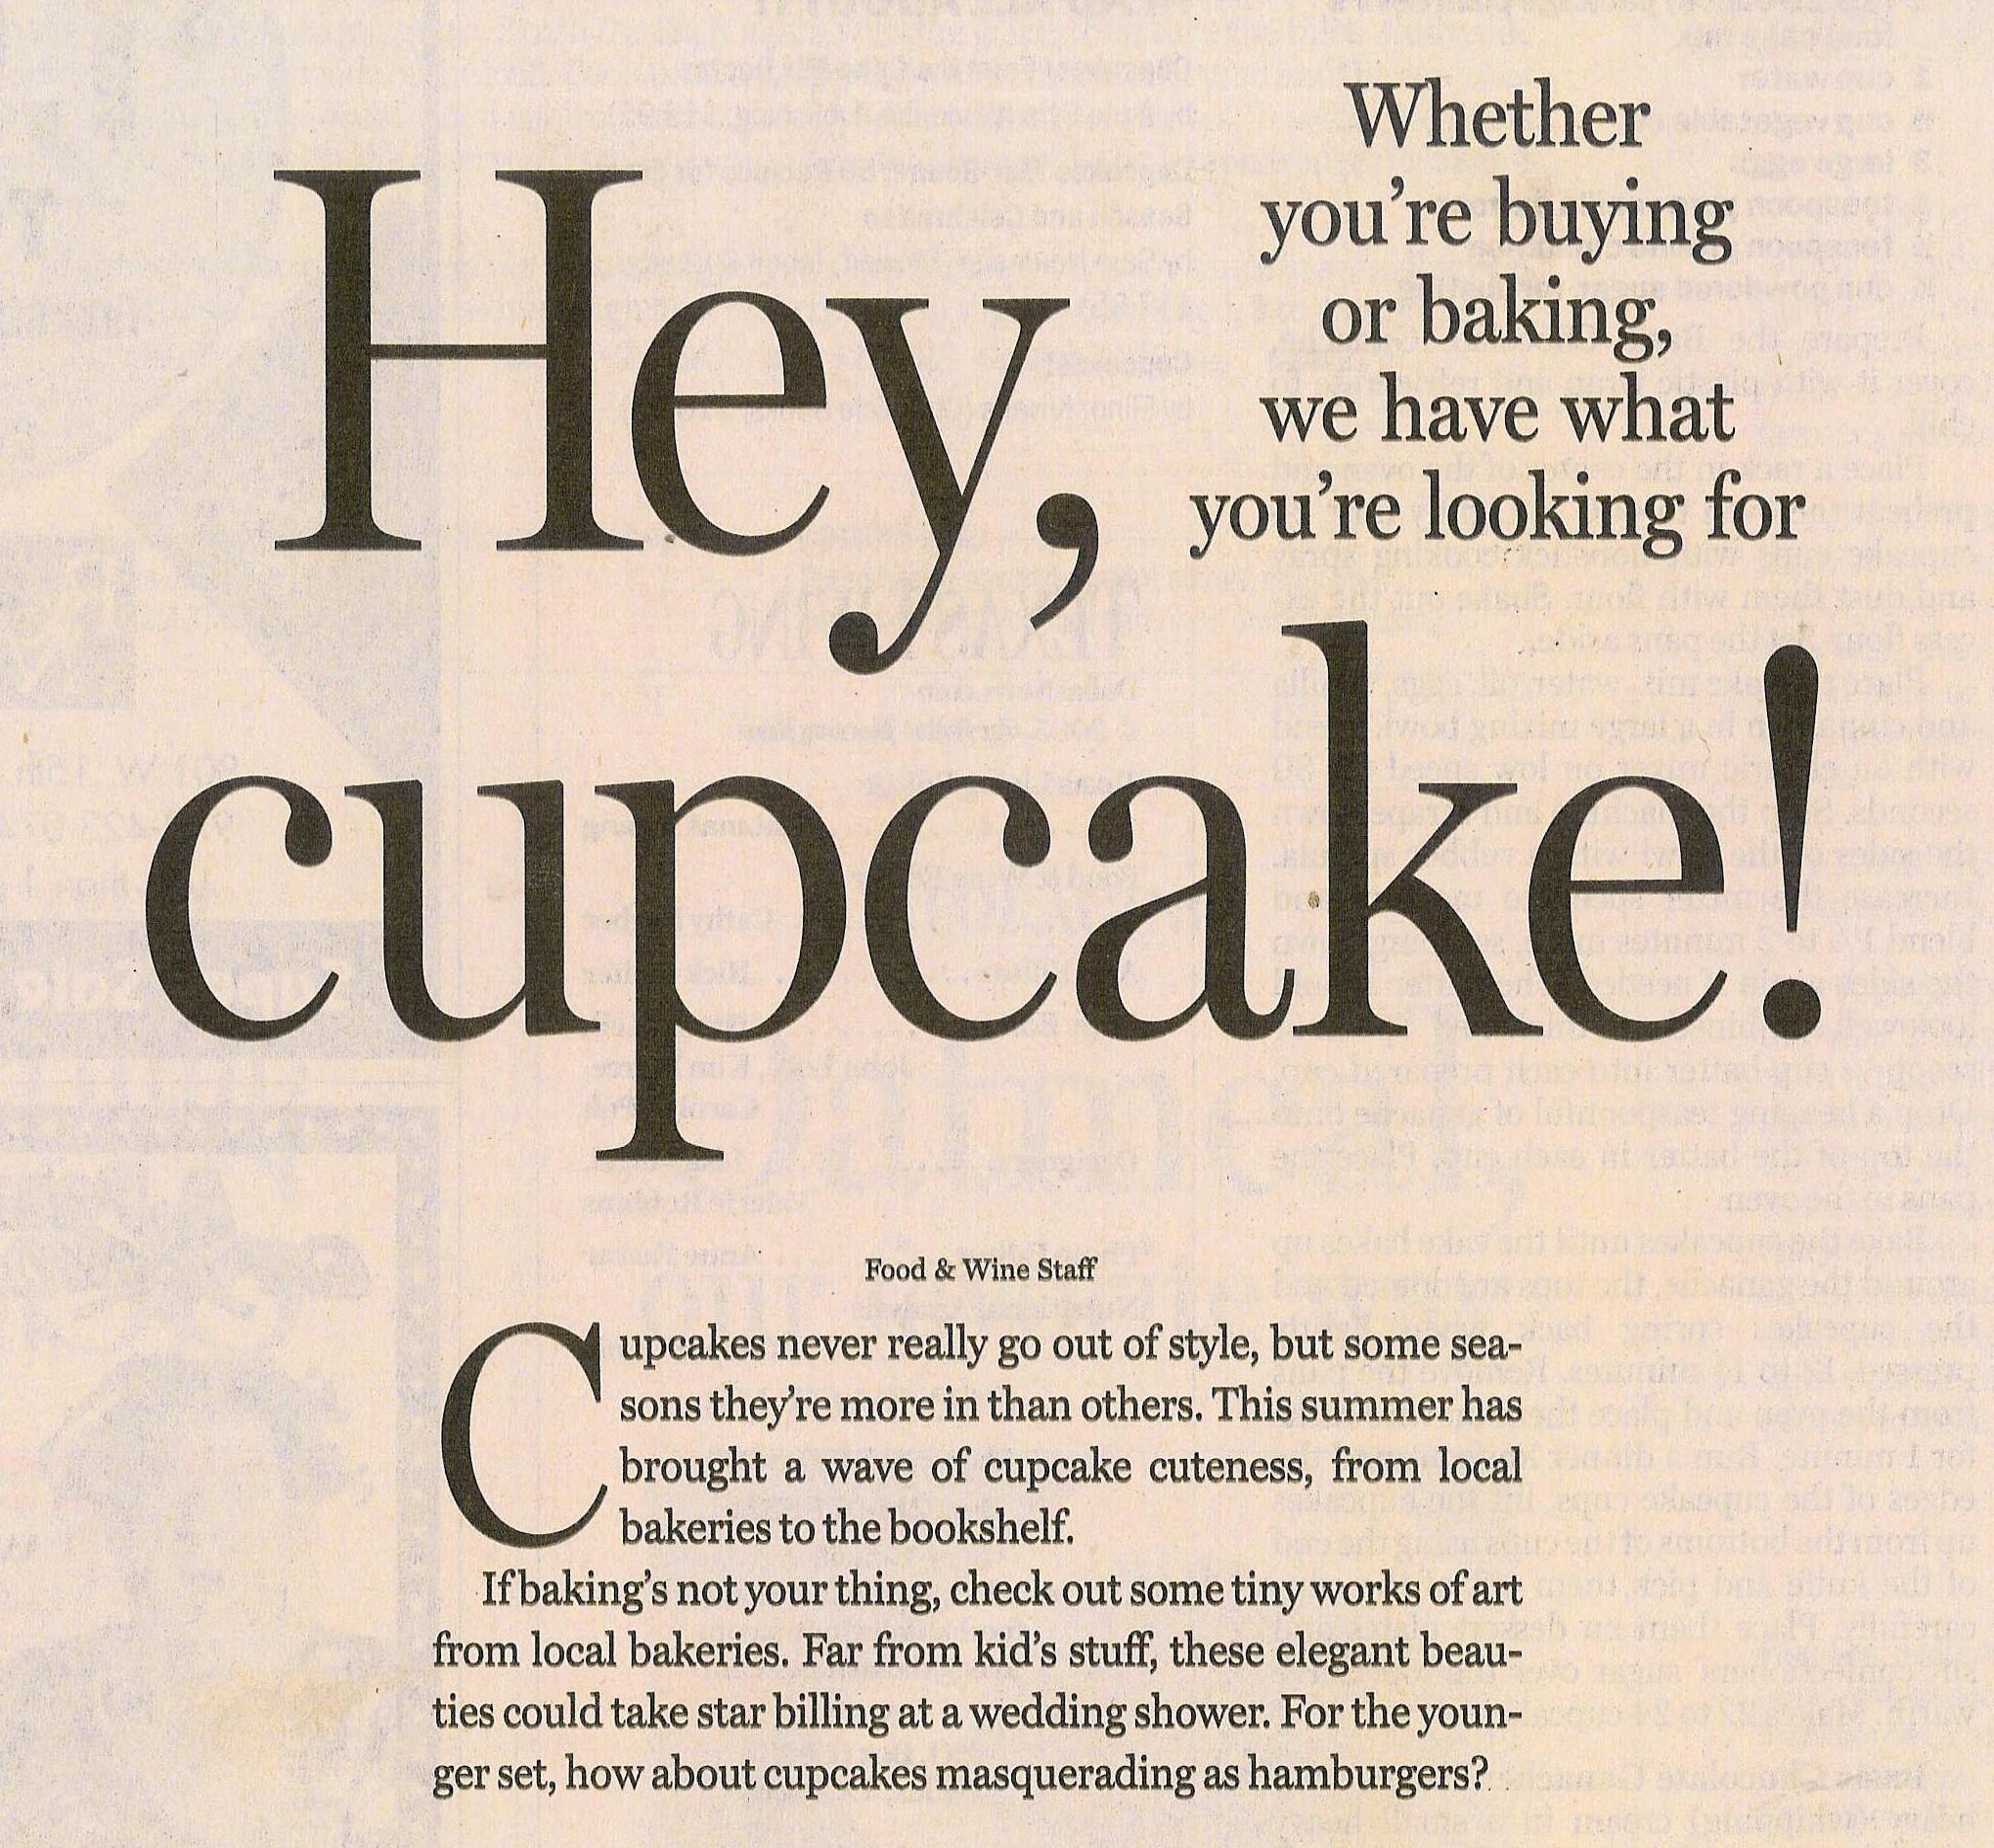 95 DMN Cupcakes copy 1